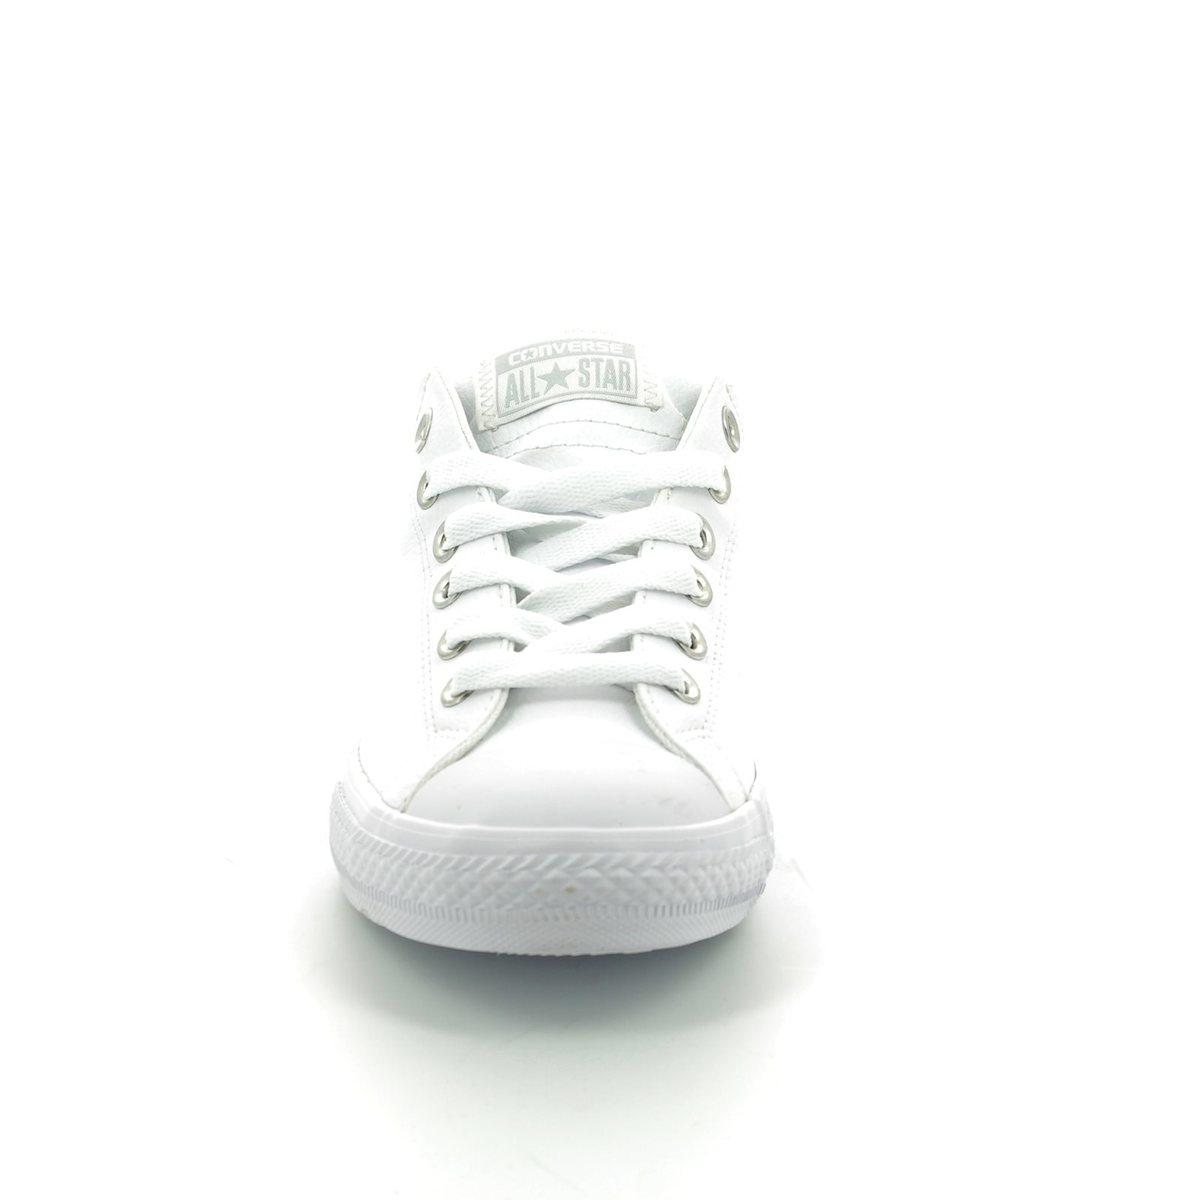 e112bb3bea57 Converse Trainers - White - 651782C Chuck Taylor All Star Street Slip